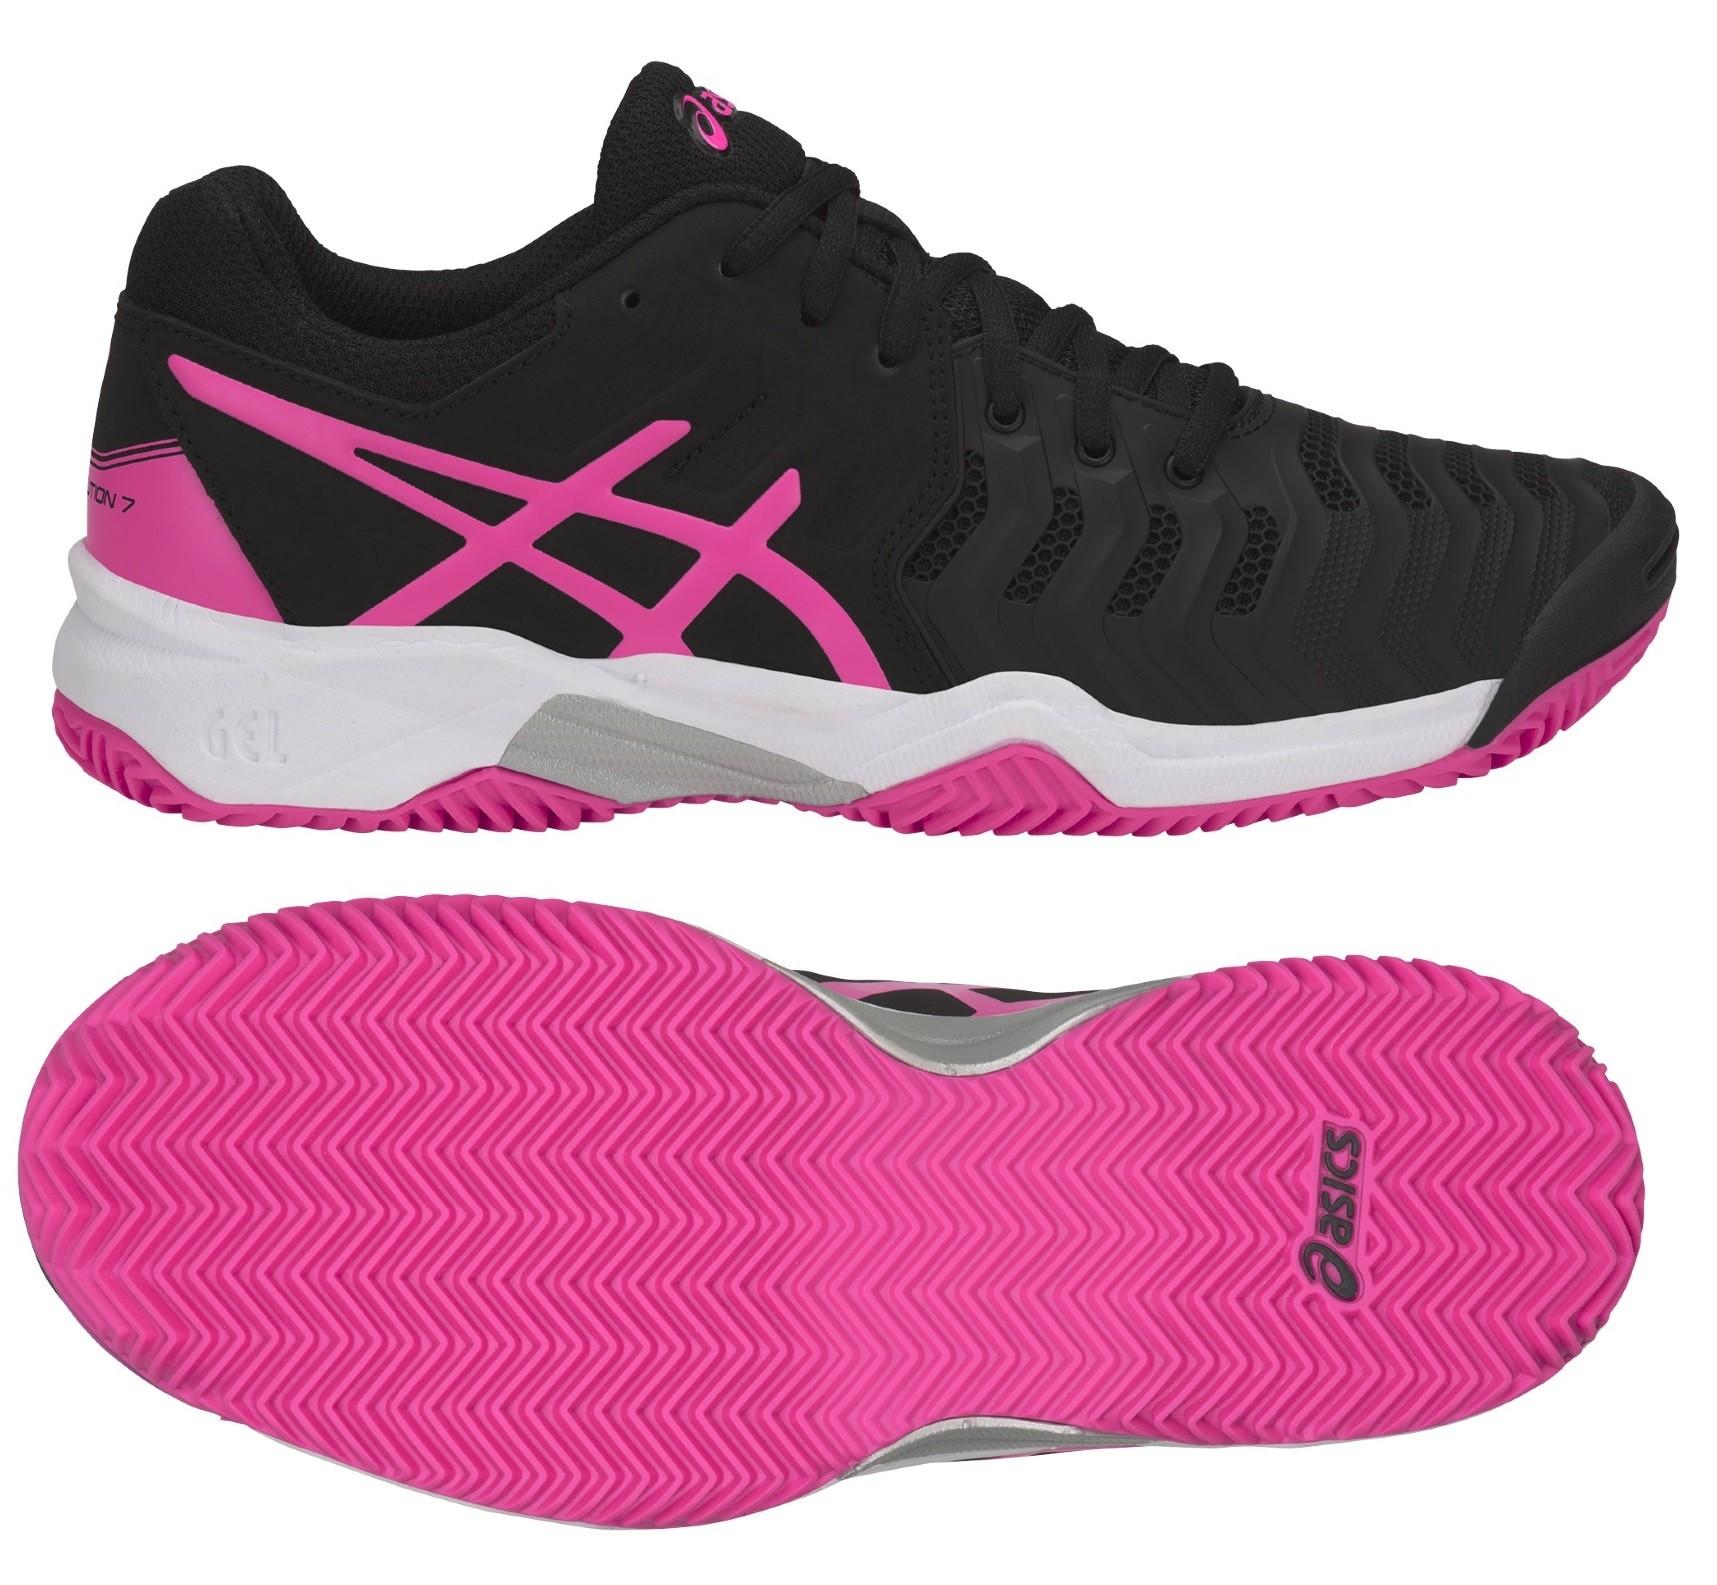 Dětská tenisová obuv Asics Gel Resolution 7 Clay GS C800Y-9020 černá s  růžovou df0b9ee43e